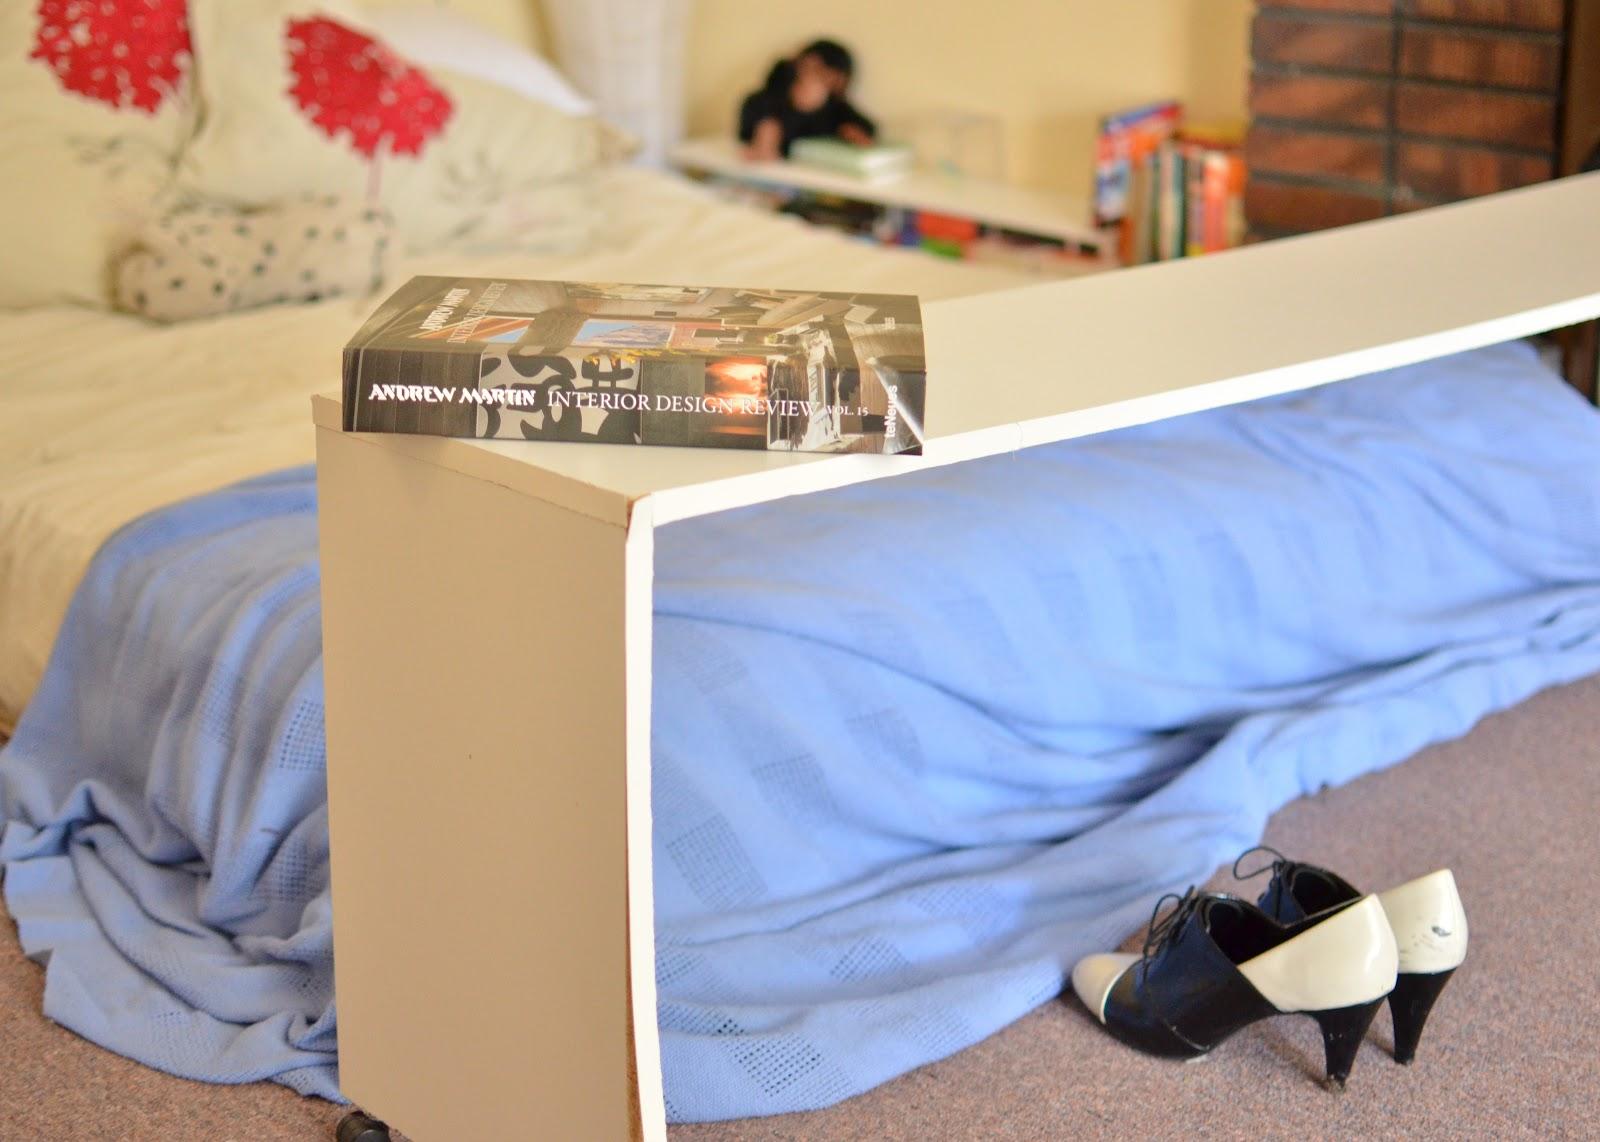 Ikea Sofa With Wheels Asda Bed 125 Over Table On  Nazarm